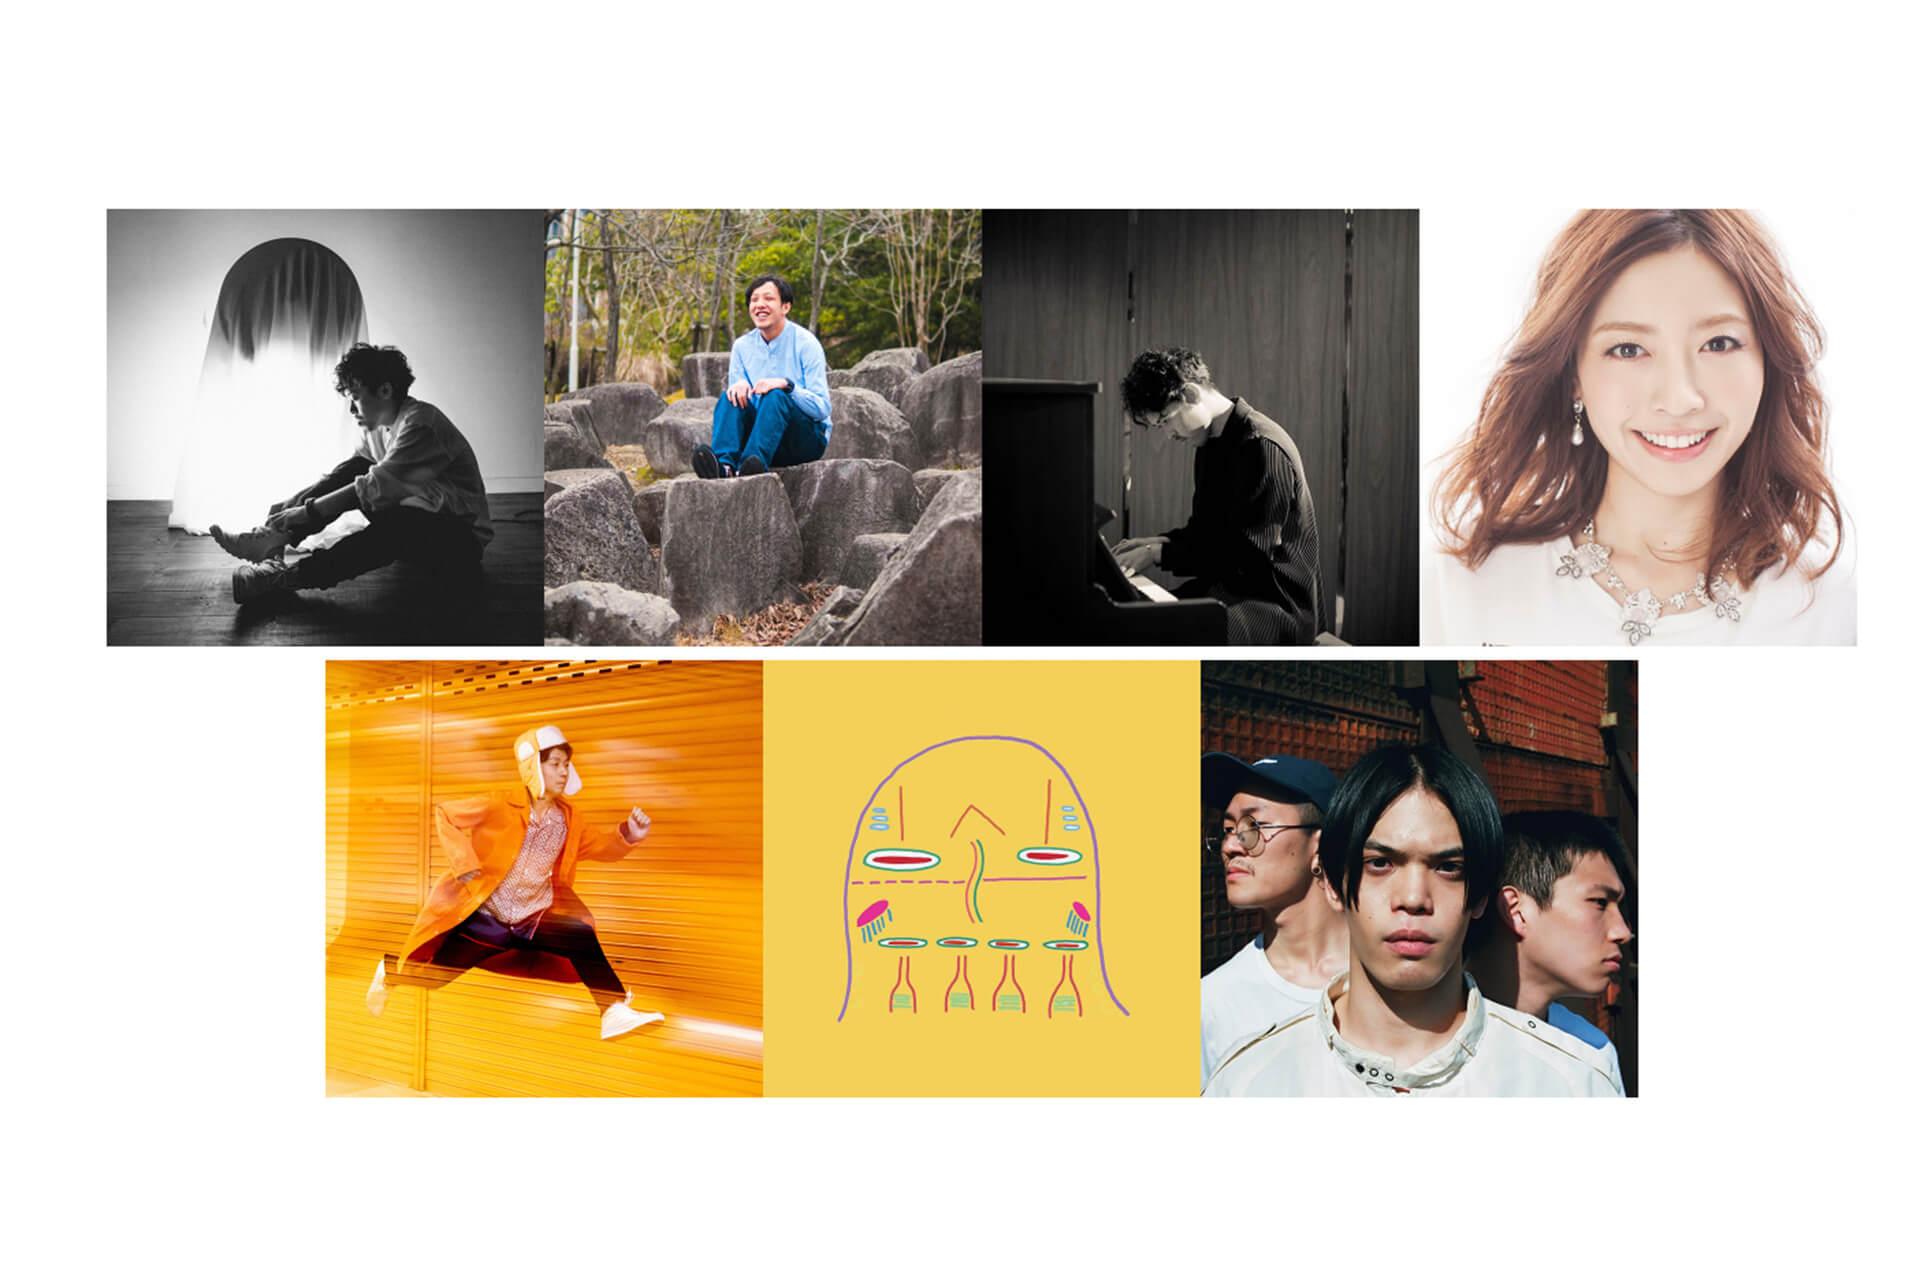 〈WARP〉から5曲セレクトするプレイリスト企画「MY WXAXRXP」第2弾に石若駿、in the blue shirt 有村 崚、江崎文武、片瀬那奈、Kenmochi Hidefumi、食品まつり a.k.a foodman、Dos Monosの7組が登場 music190926-WXAXRXP